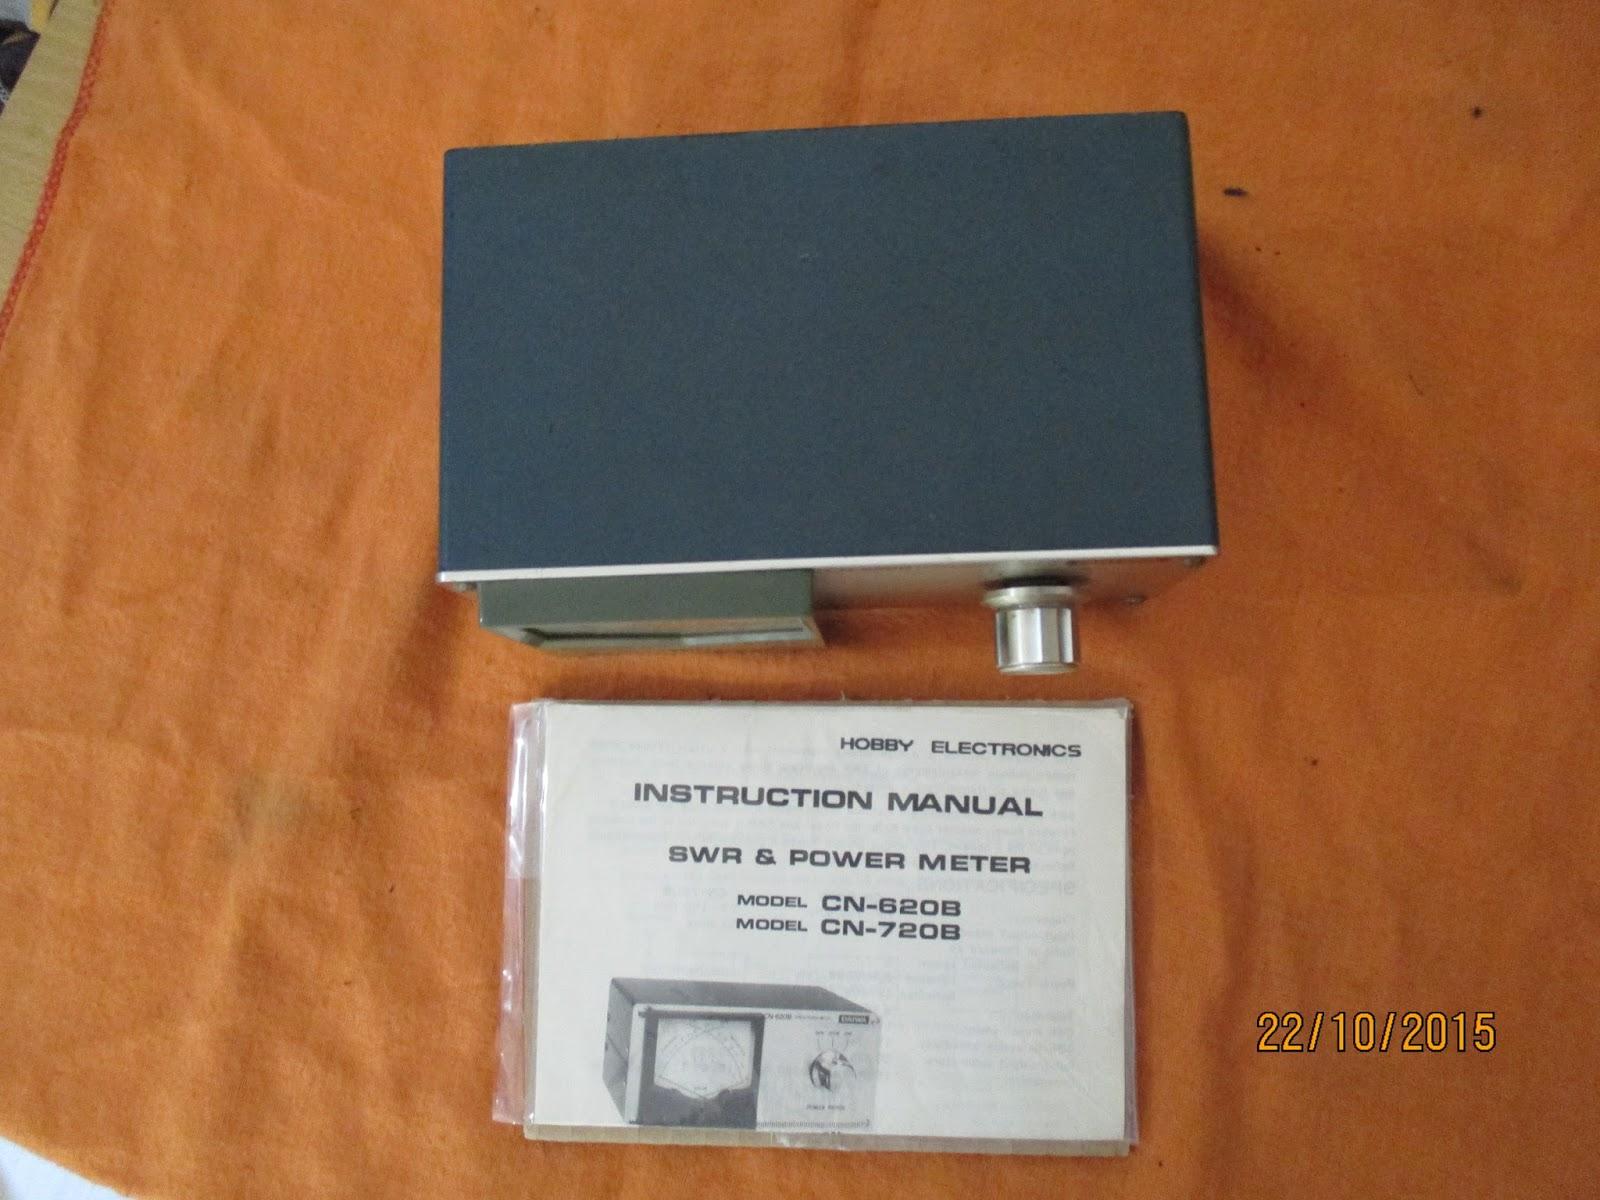 Daiwa swr power meter Manual on